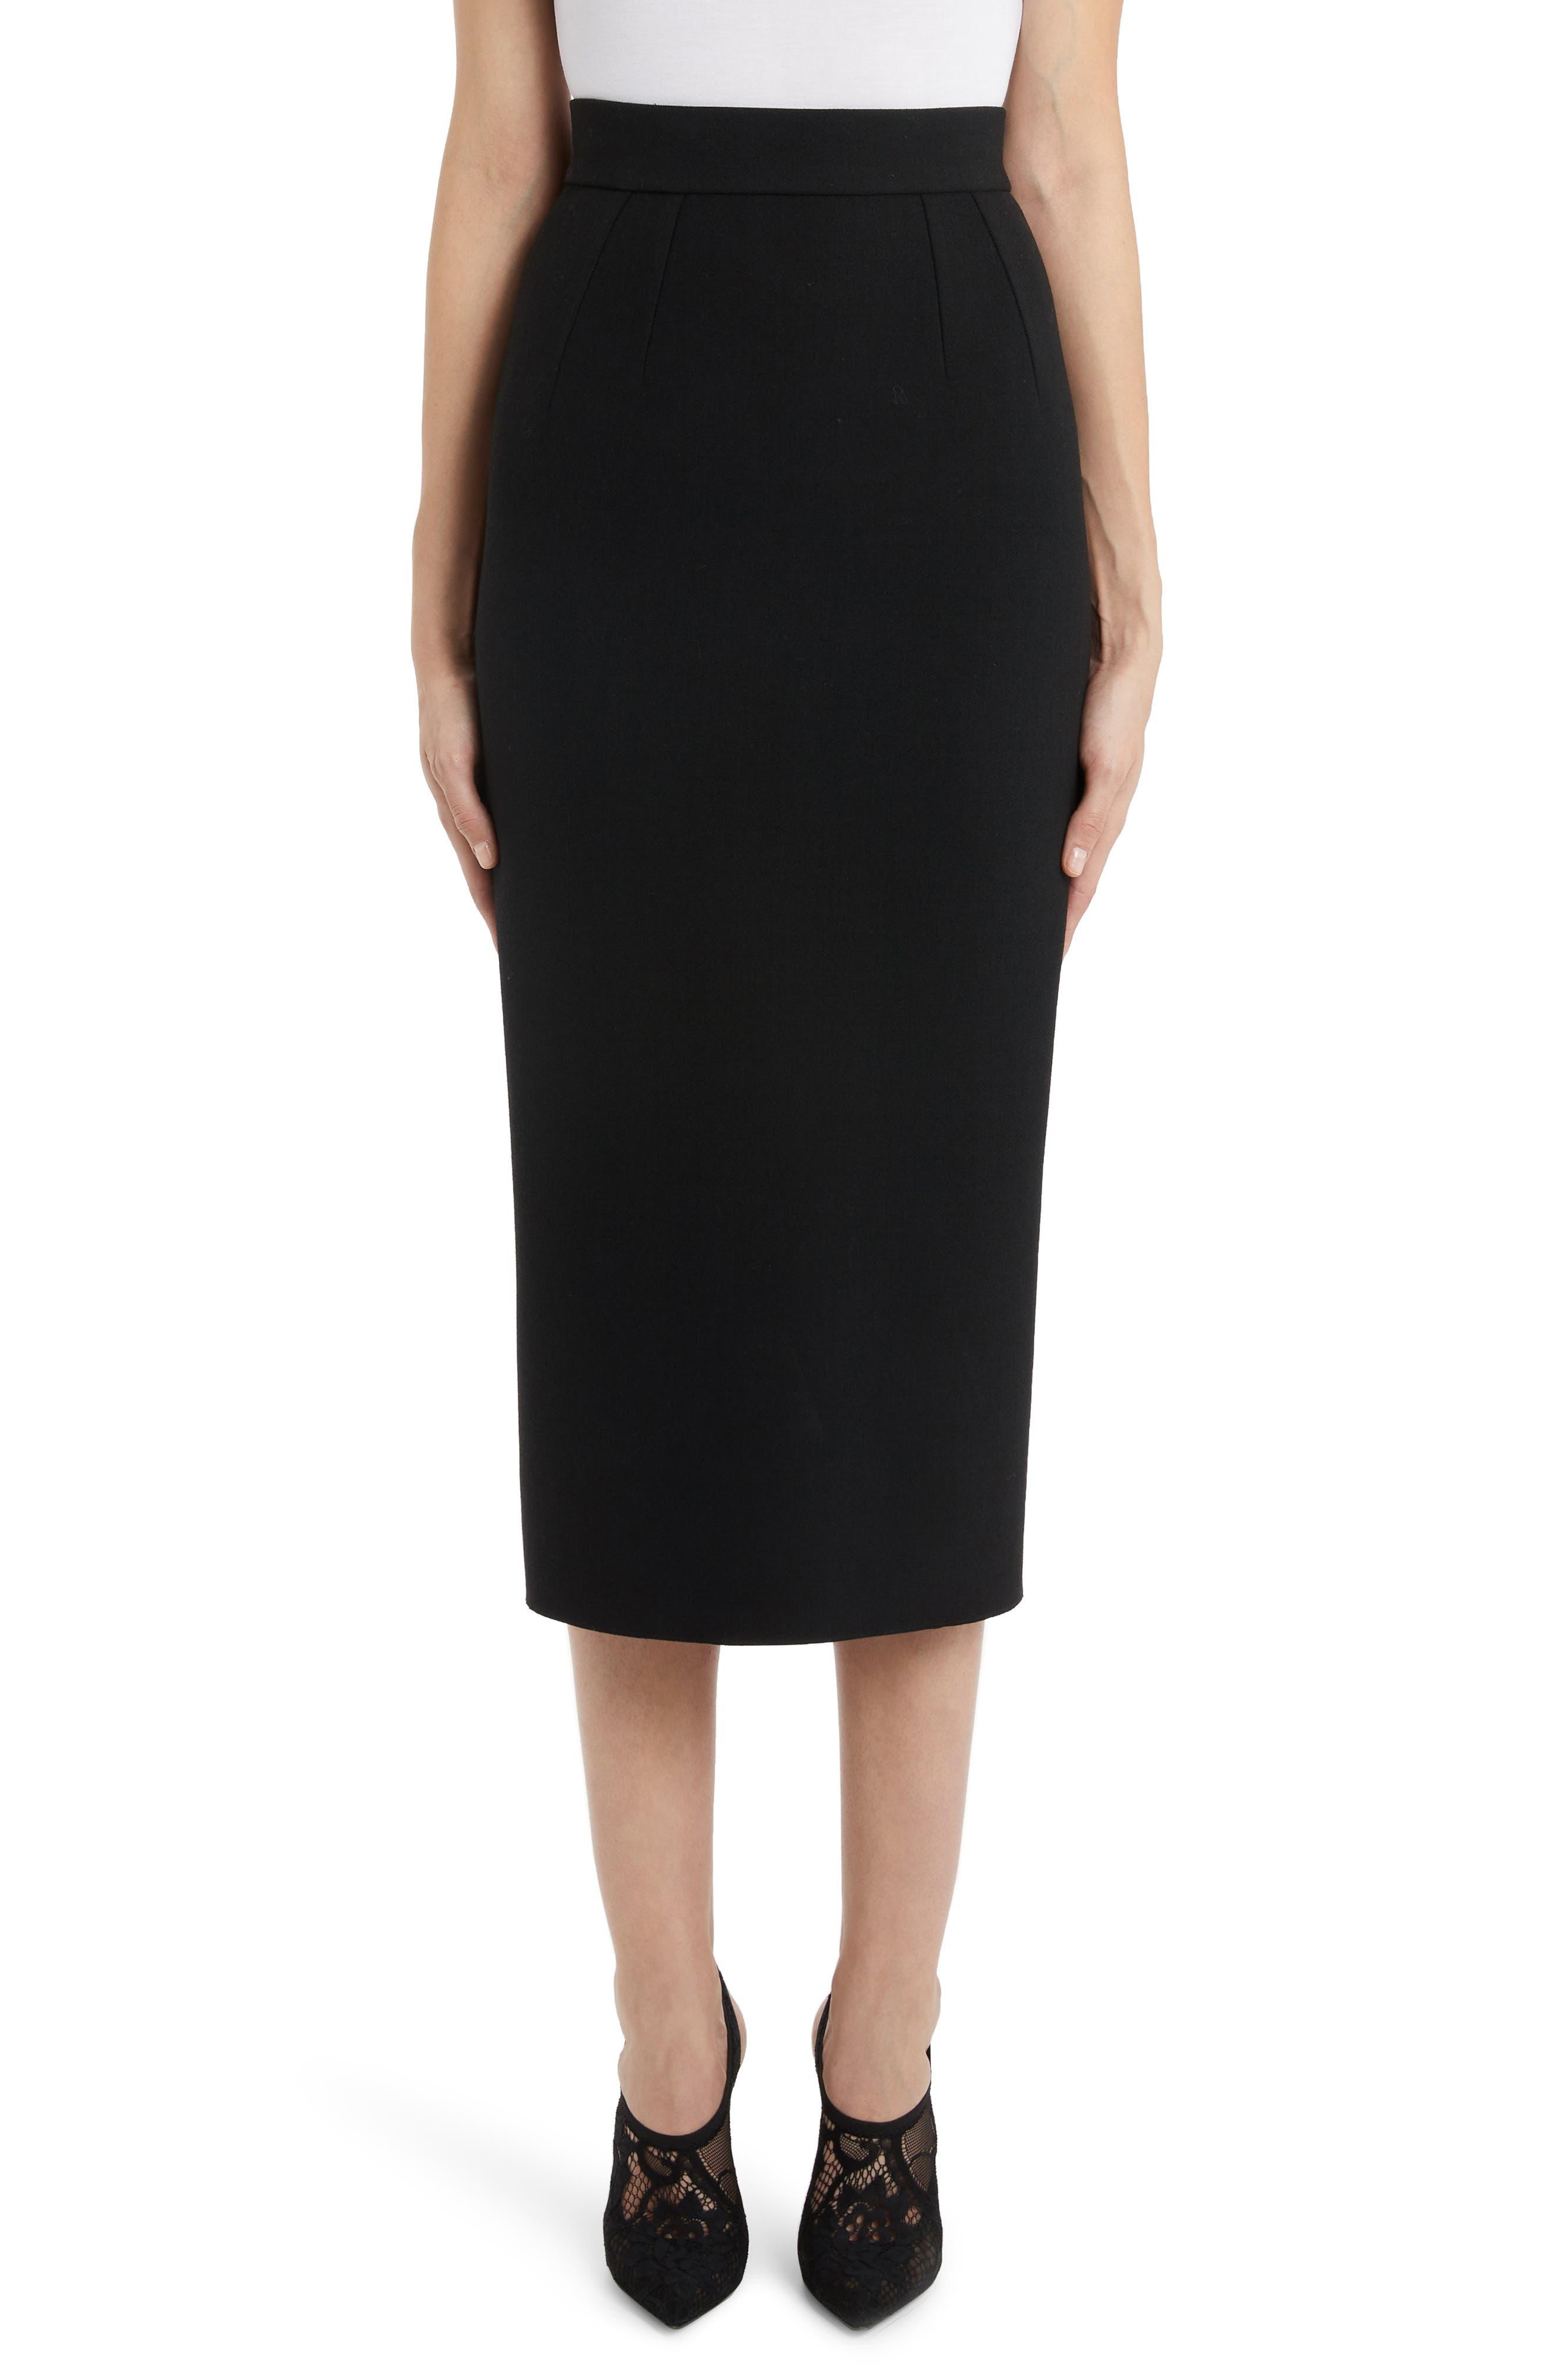 Dolce&gabbana Skirts Midi Pencil Skirt